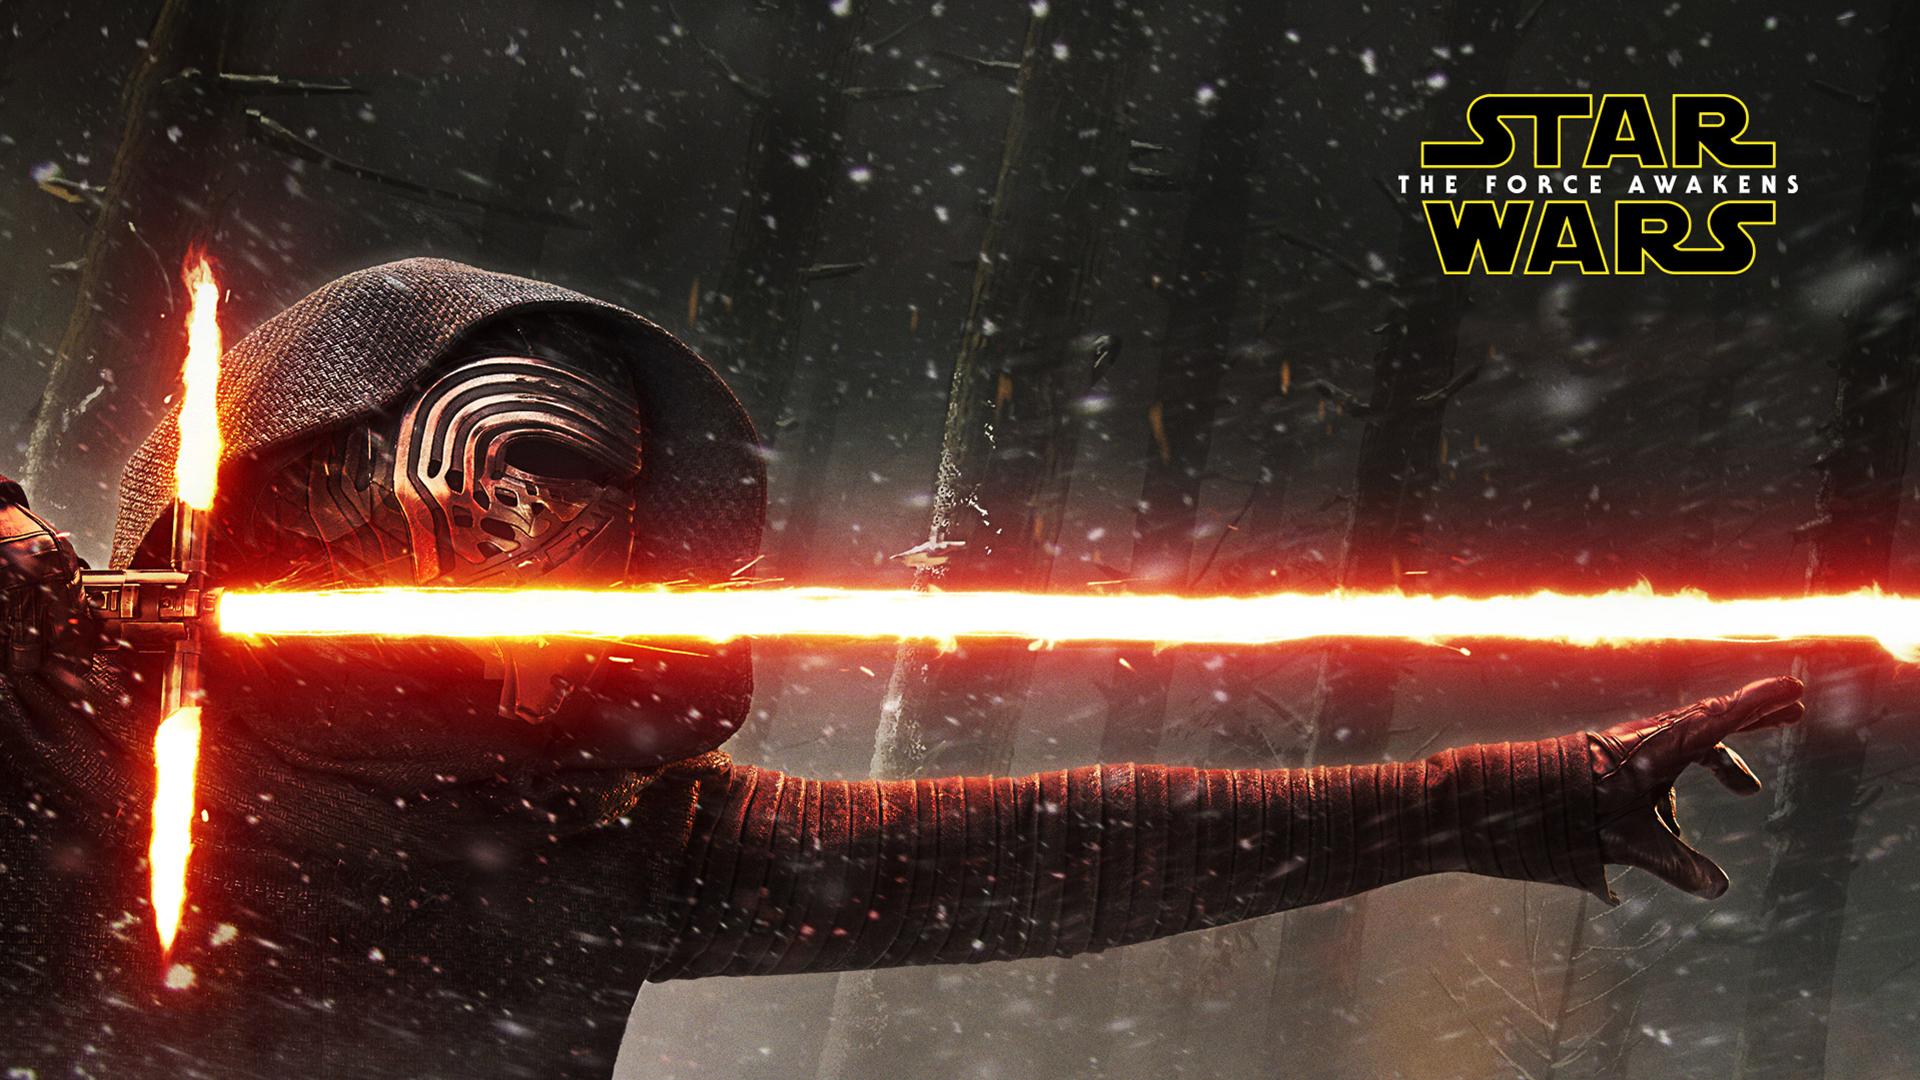 Star Wars: The Force Awakens (2015) (HD wallpapers) | VolGanga